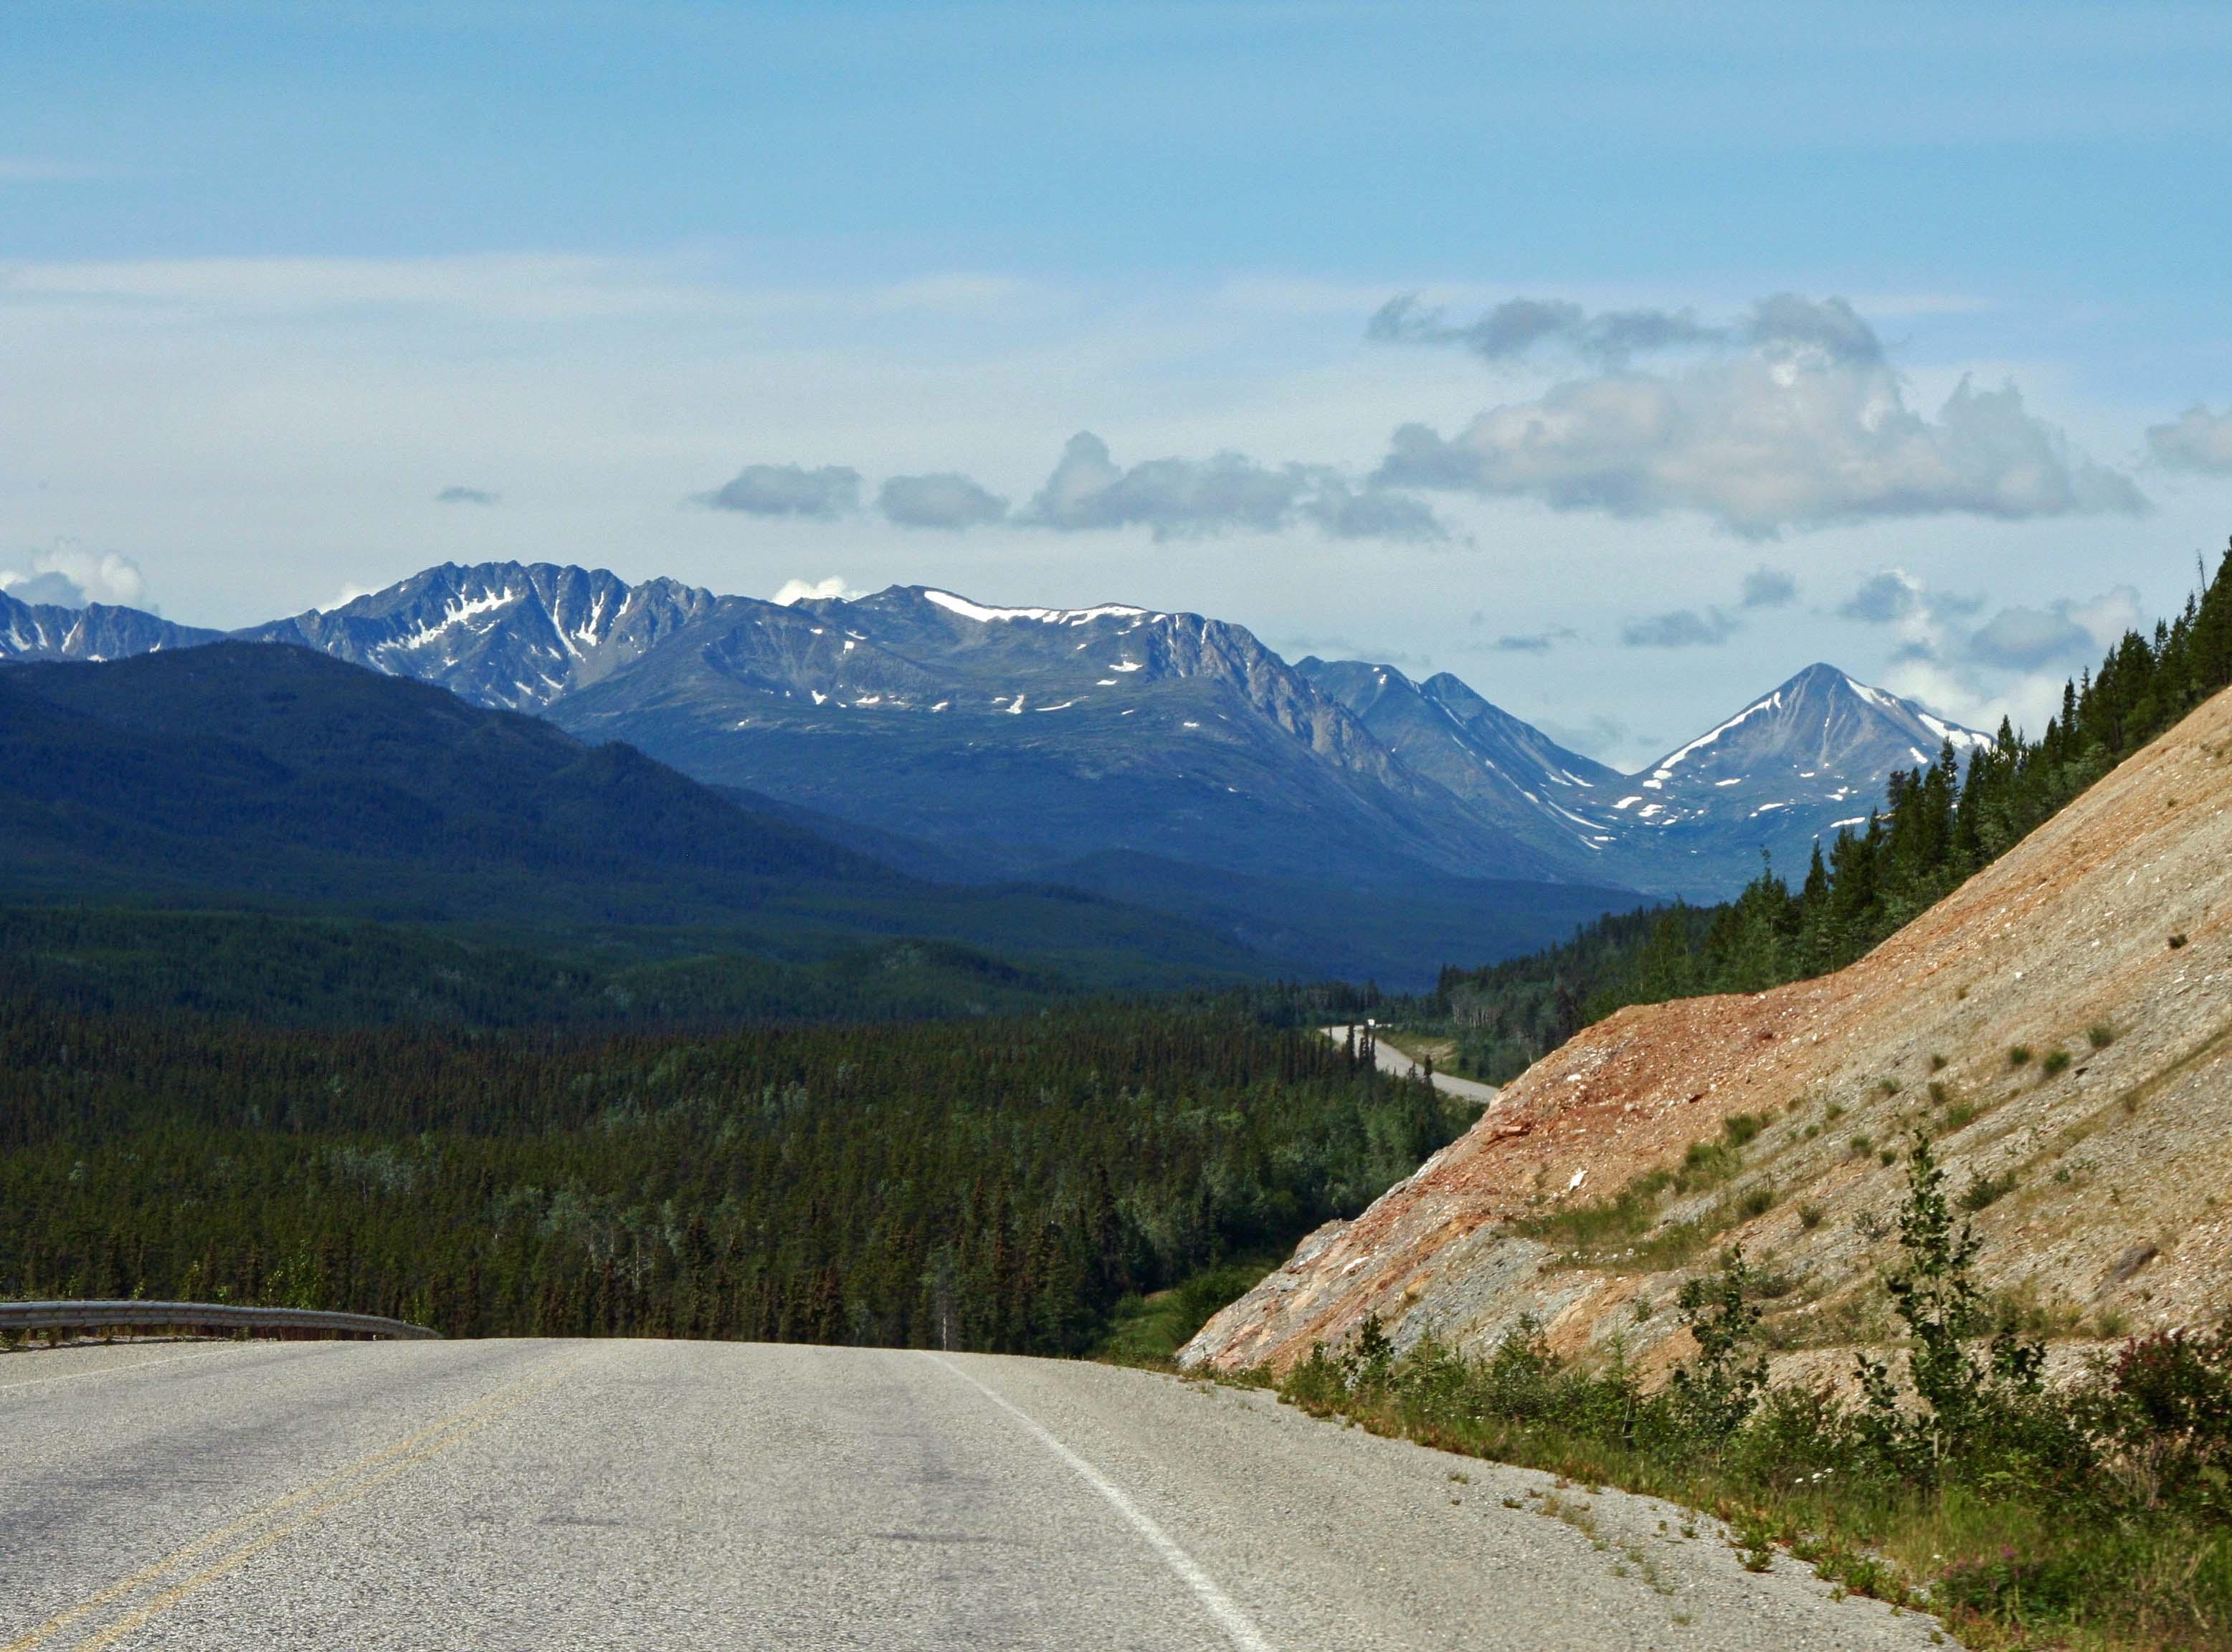 Yukon Territory, Alaska Highway